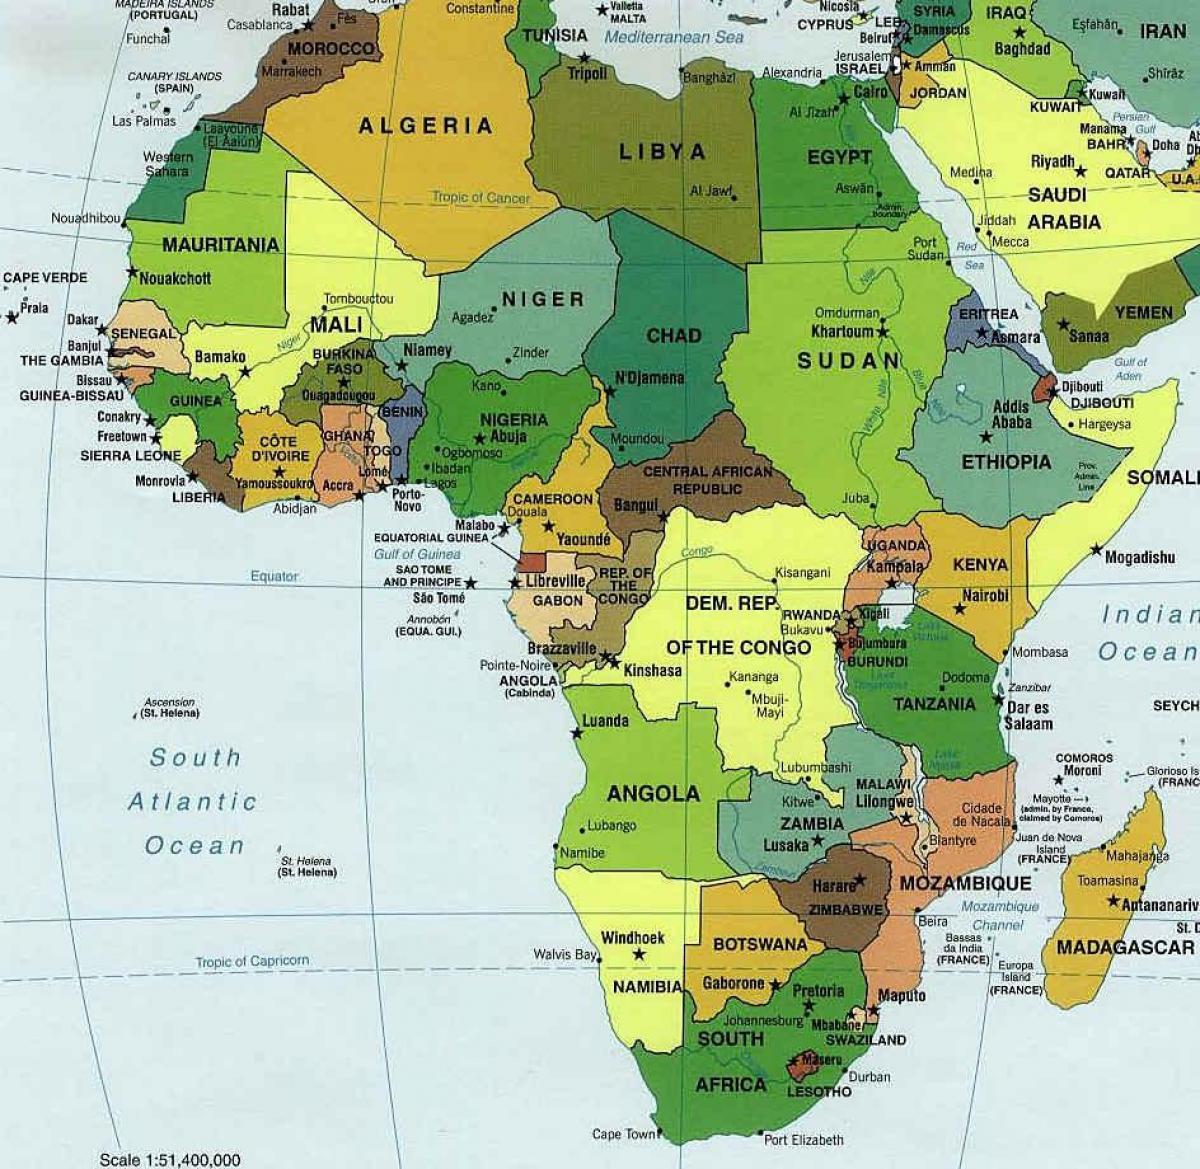 Cartina Africa Sud.Zambia Sud Africa Mappa Mappa Dello Zambia Sud Africa Africa Orientale Africa